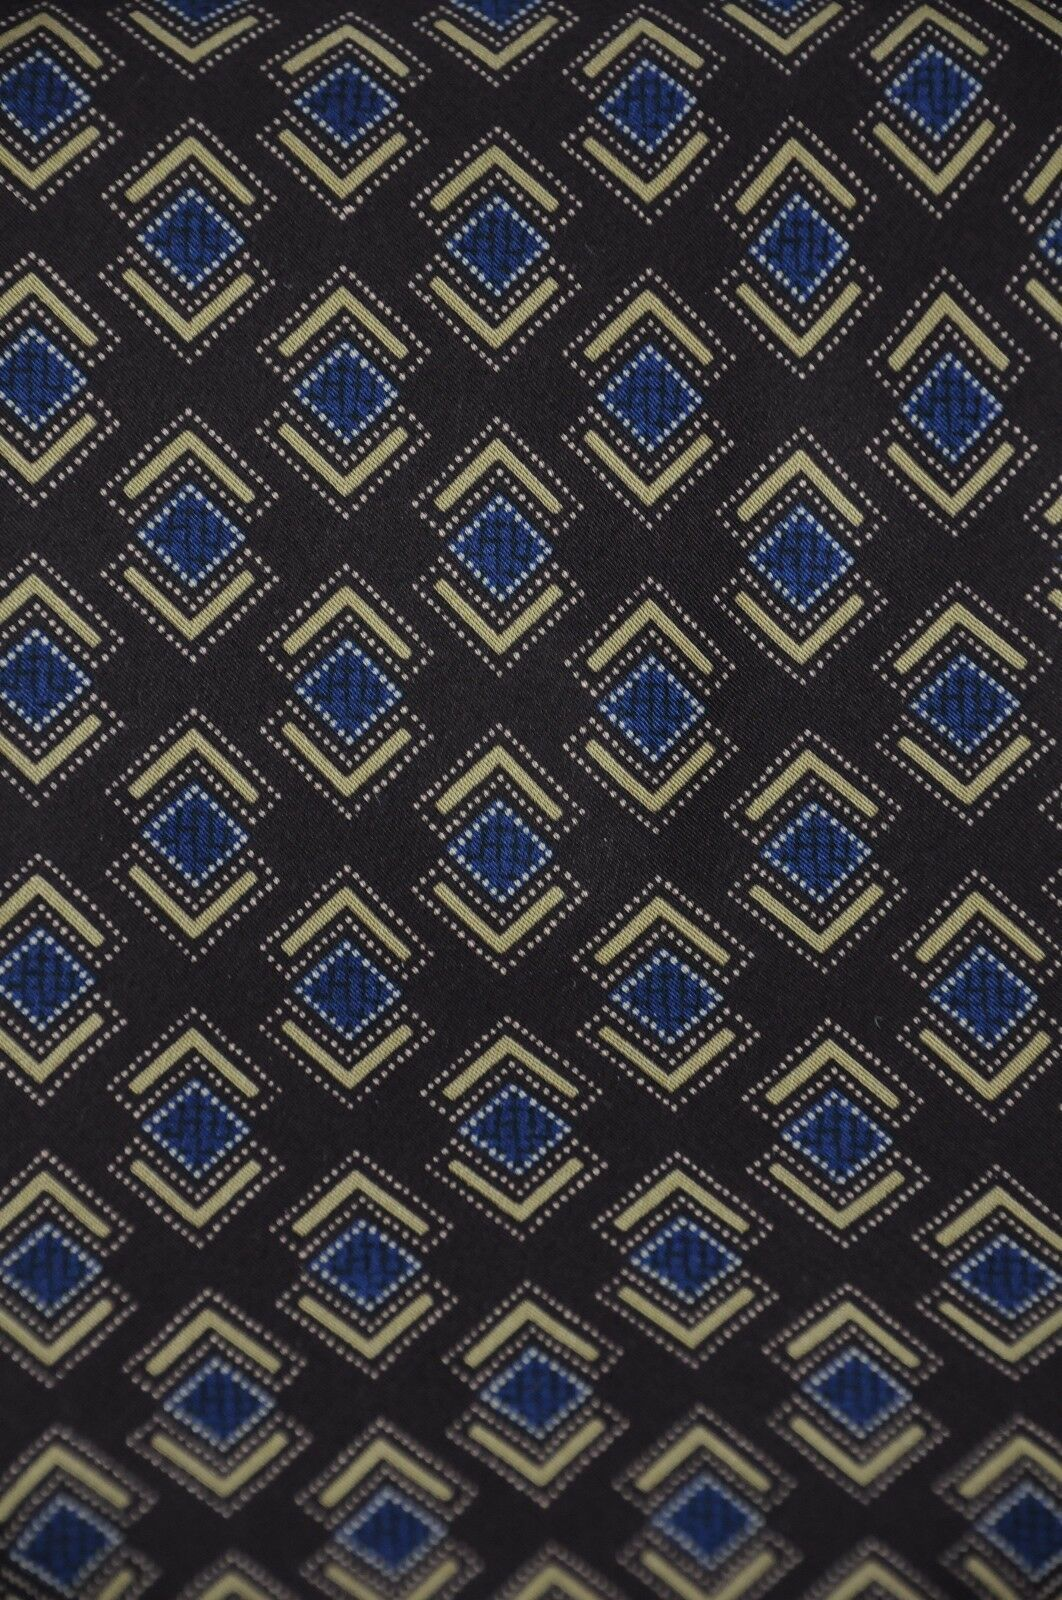 Kenneth Cole Men's Tie Eggplant Blue & Gold Printed Silk Necktie 56 x 4 in. image 3